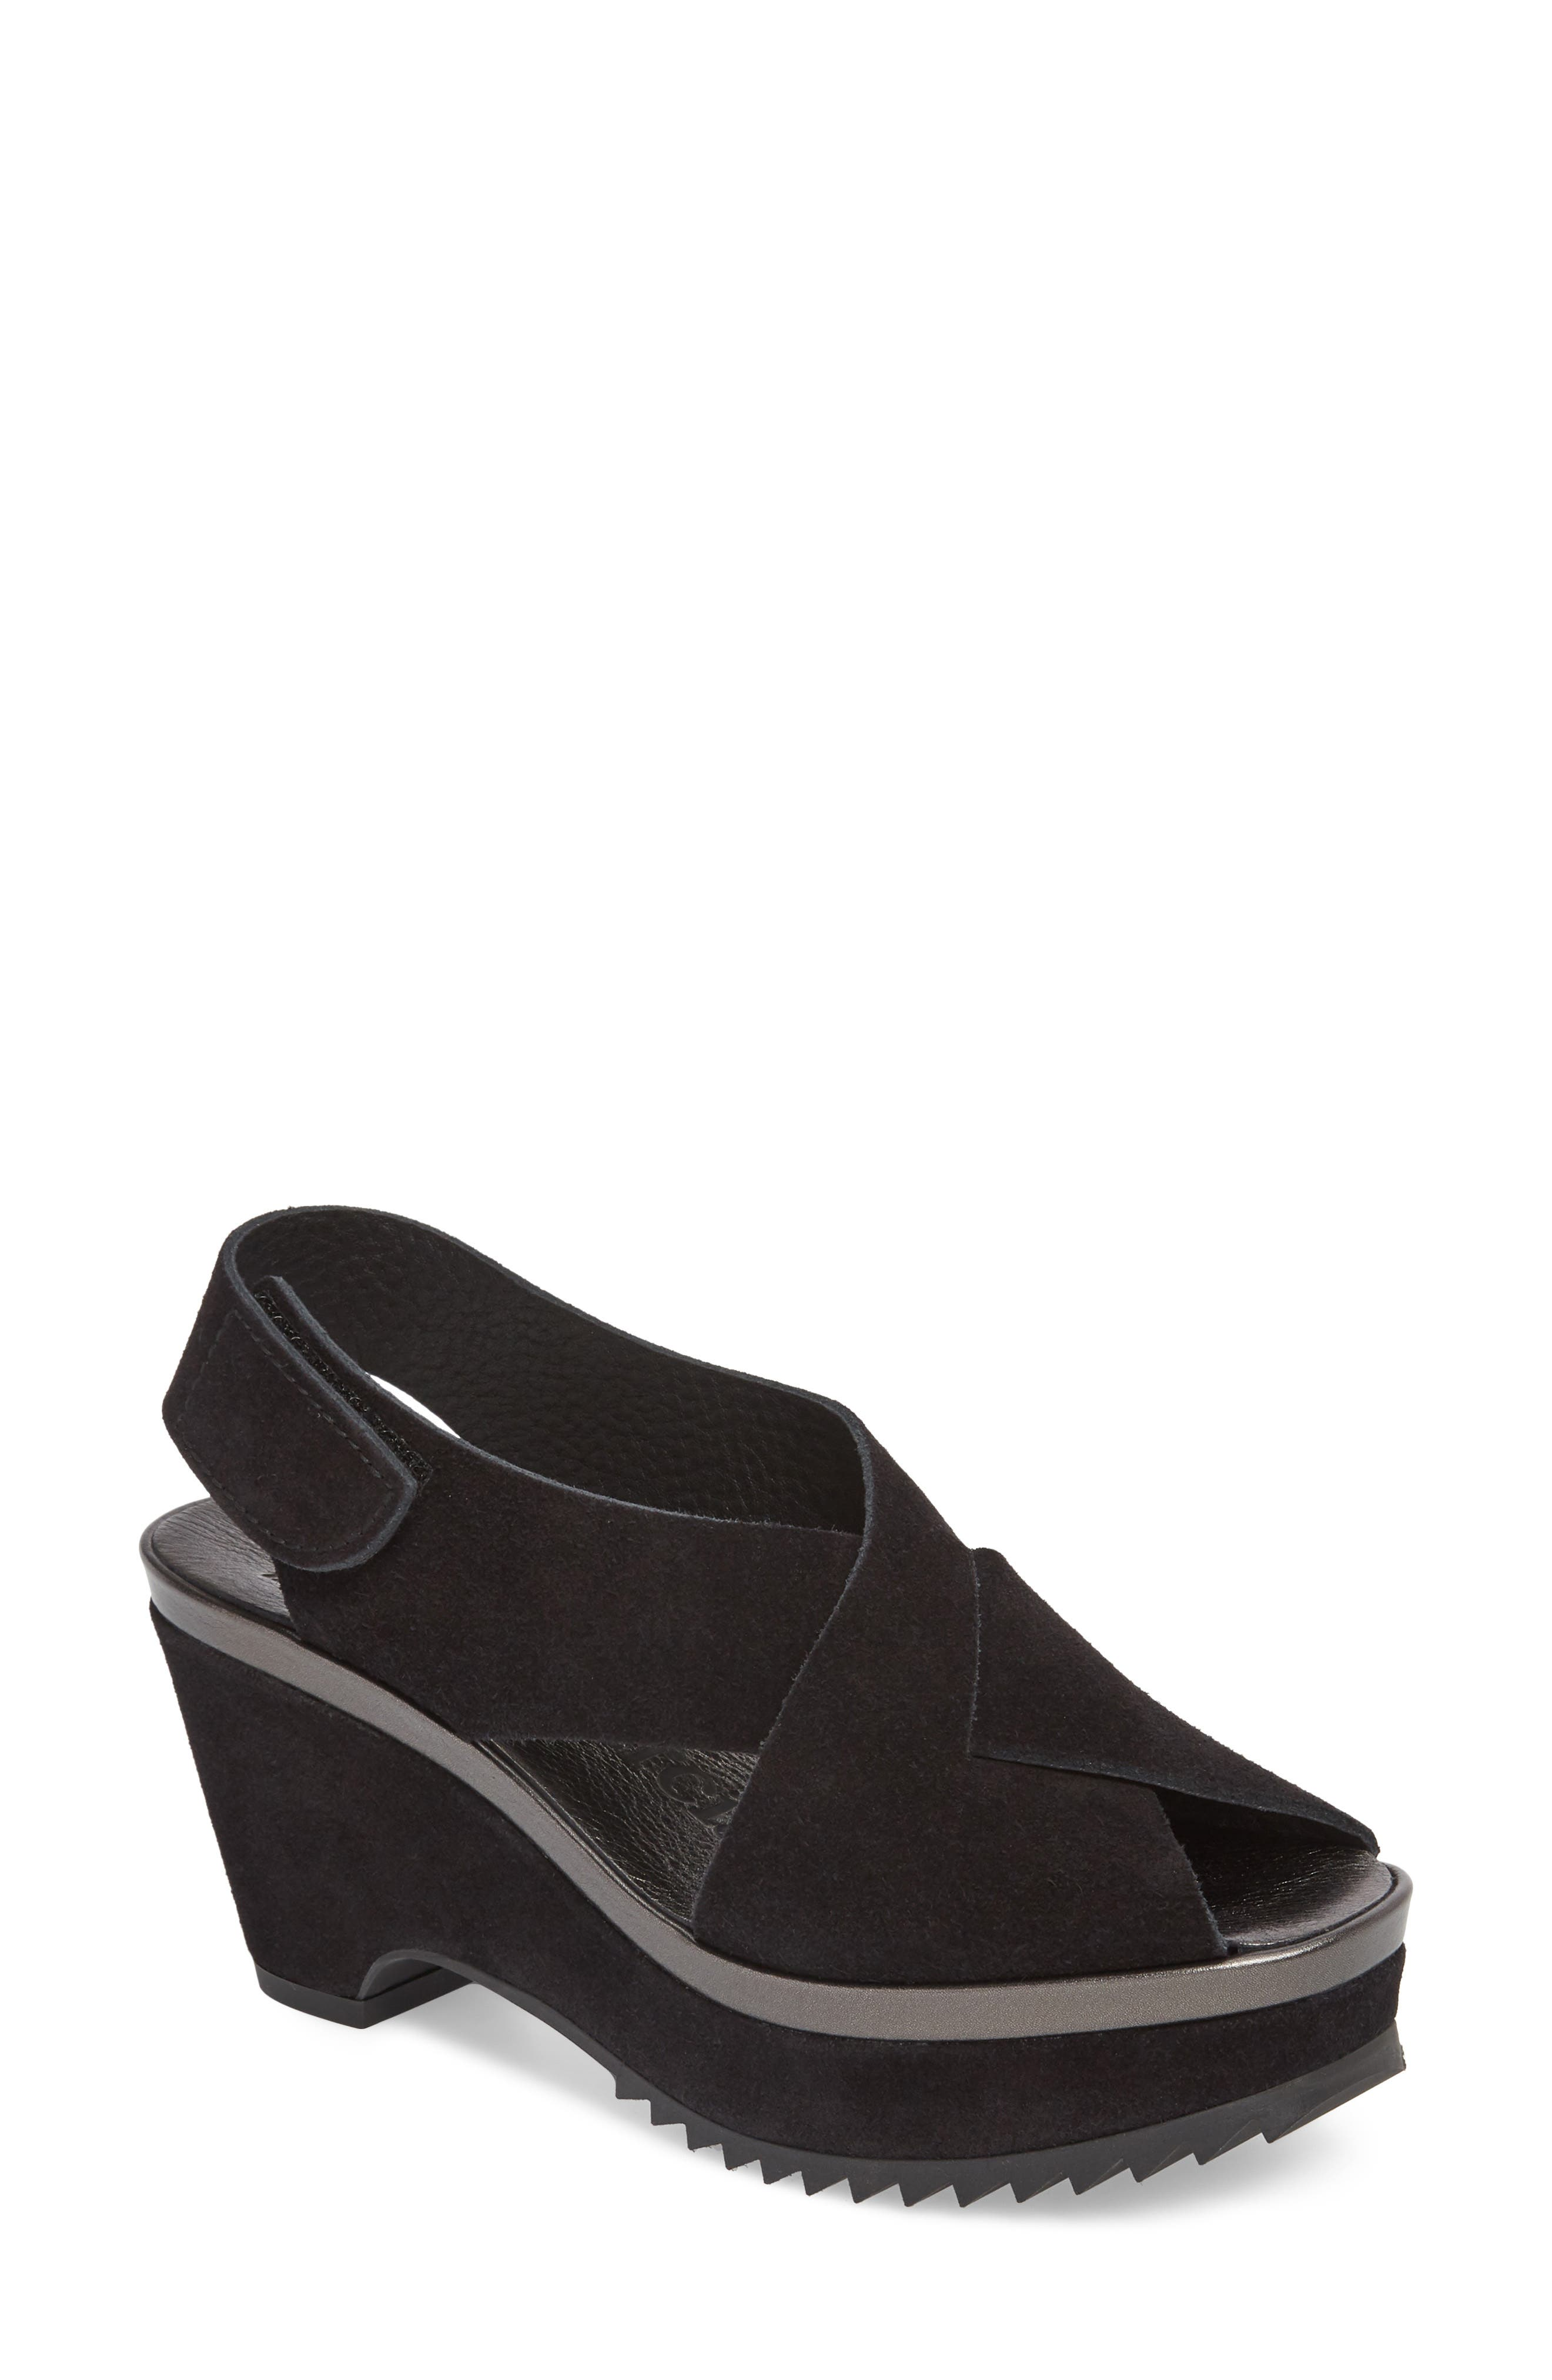 Fayre Cross Strap Wedge Sandal,                             Main thumbnail 1, color,                             BLACK